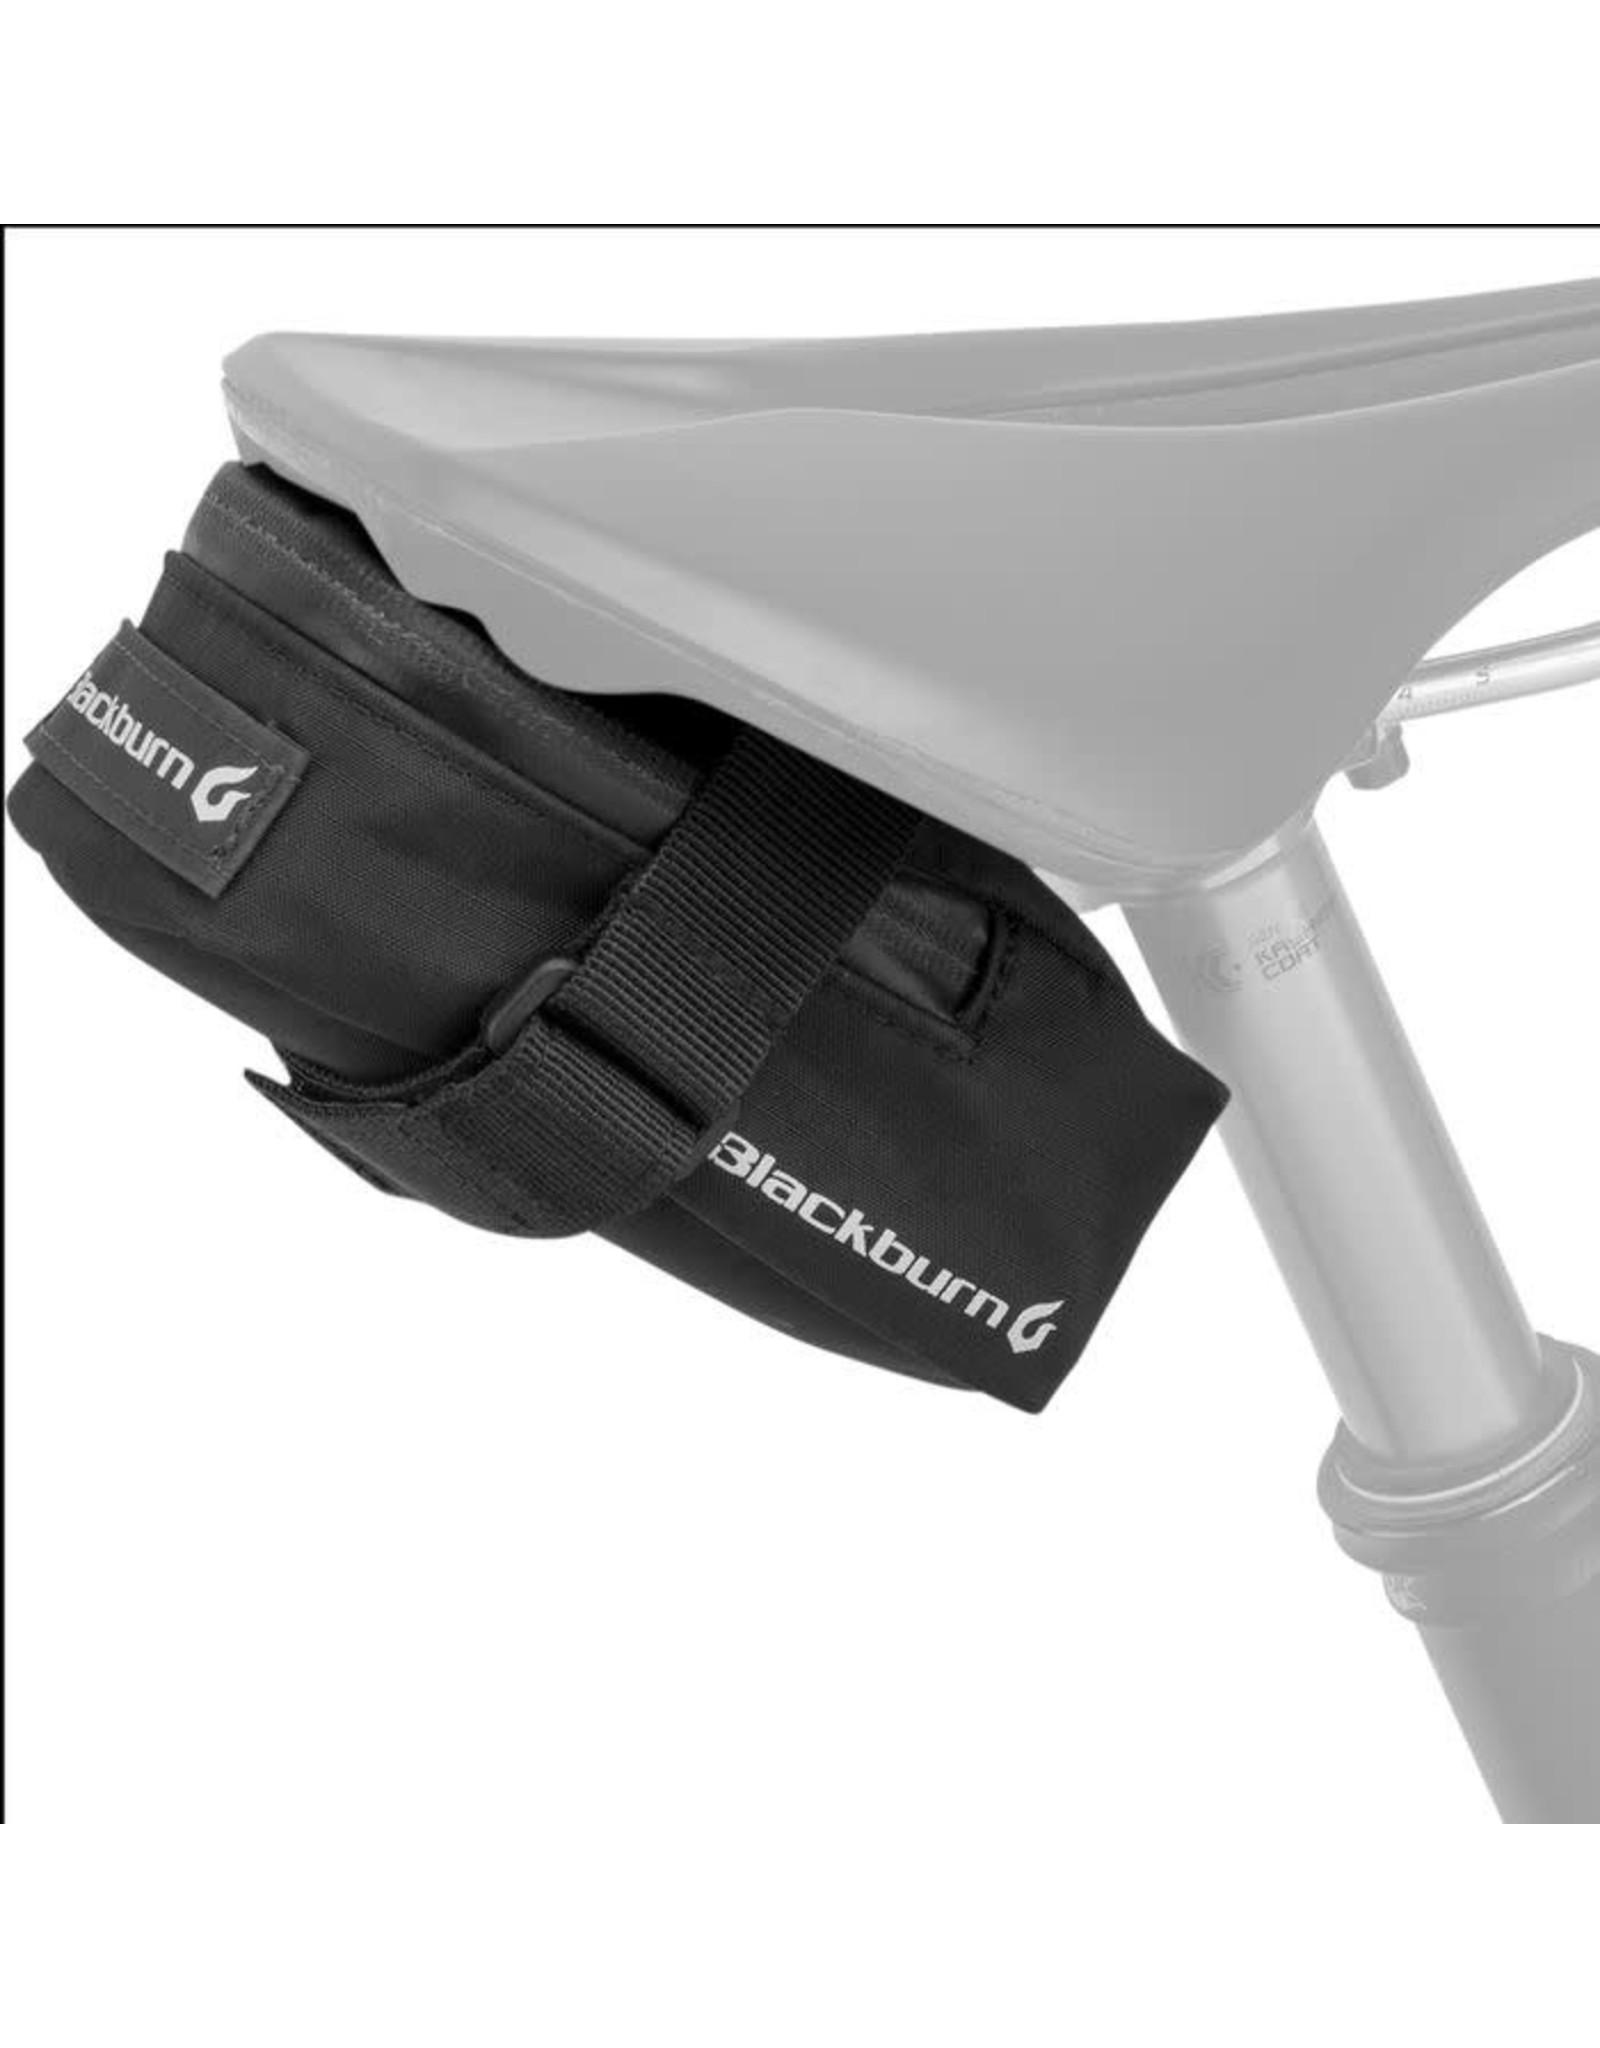 Blackburn Blackburn Grid MTB Micro Seat Bag - Black - Reflective